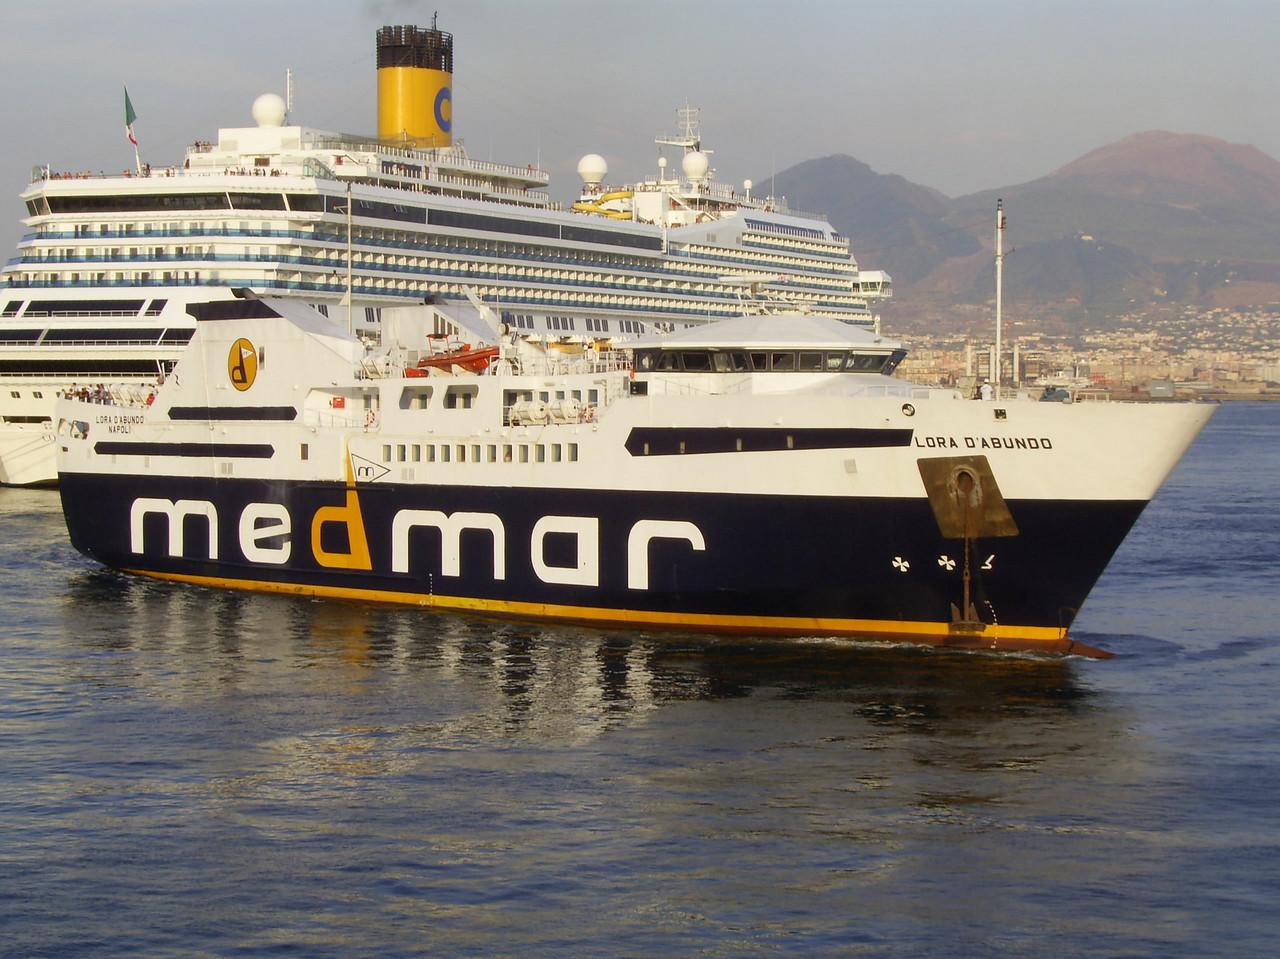 2007 - F/B LORA D'ABUNDO arriving to Napoli.